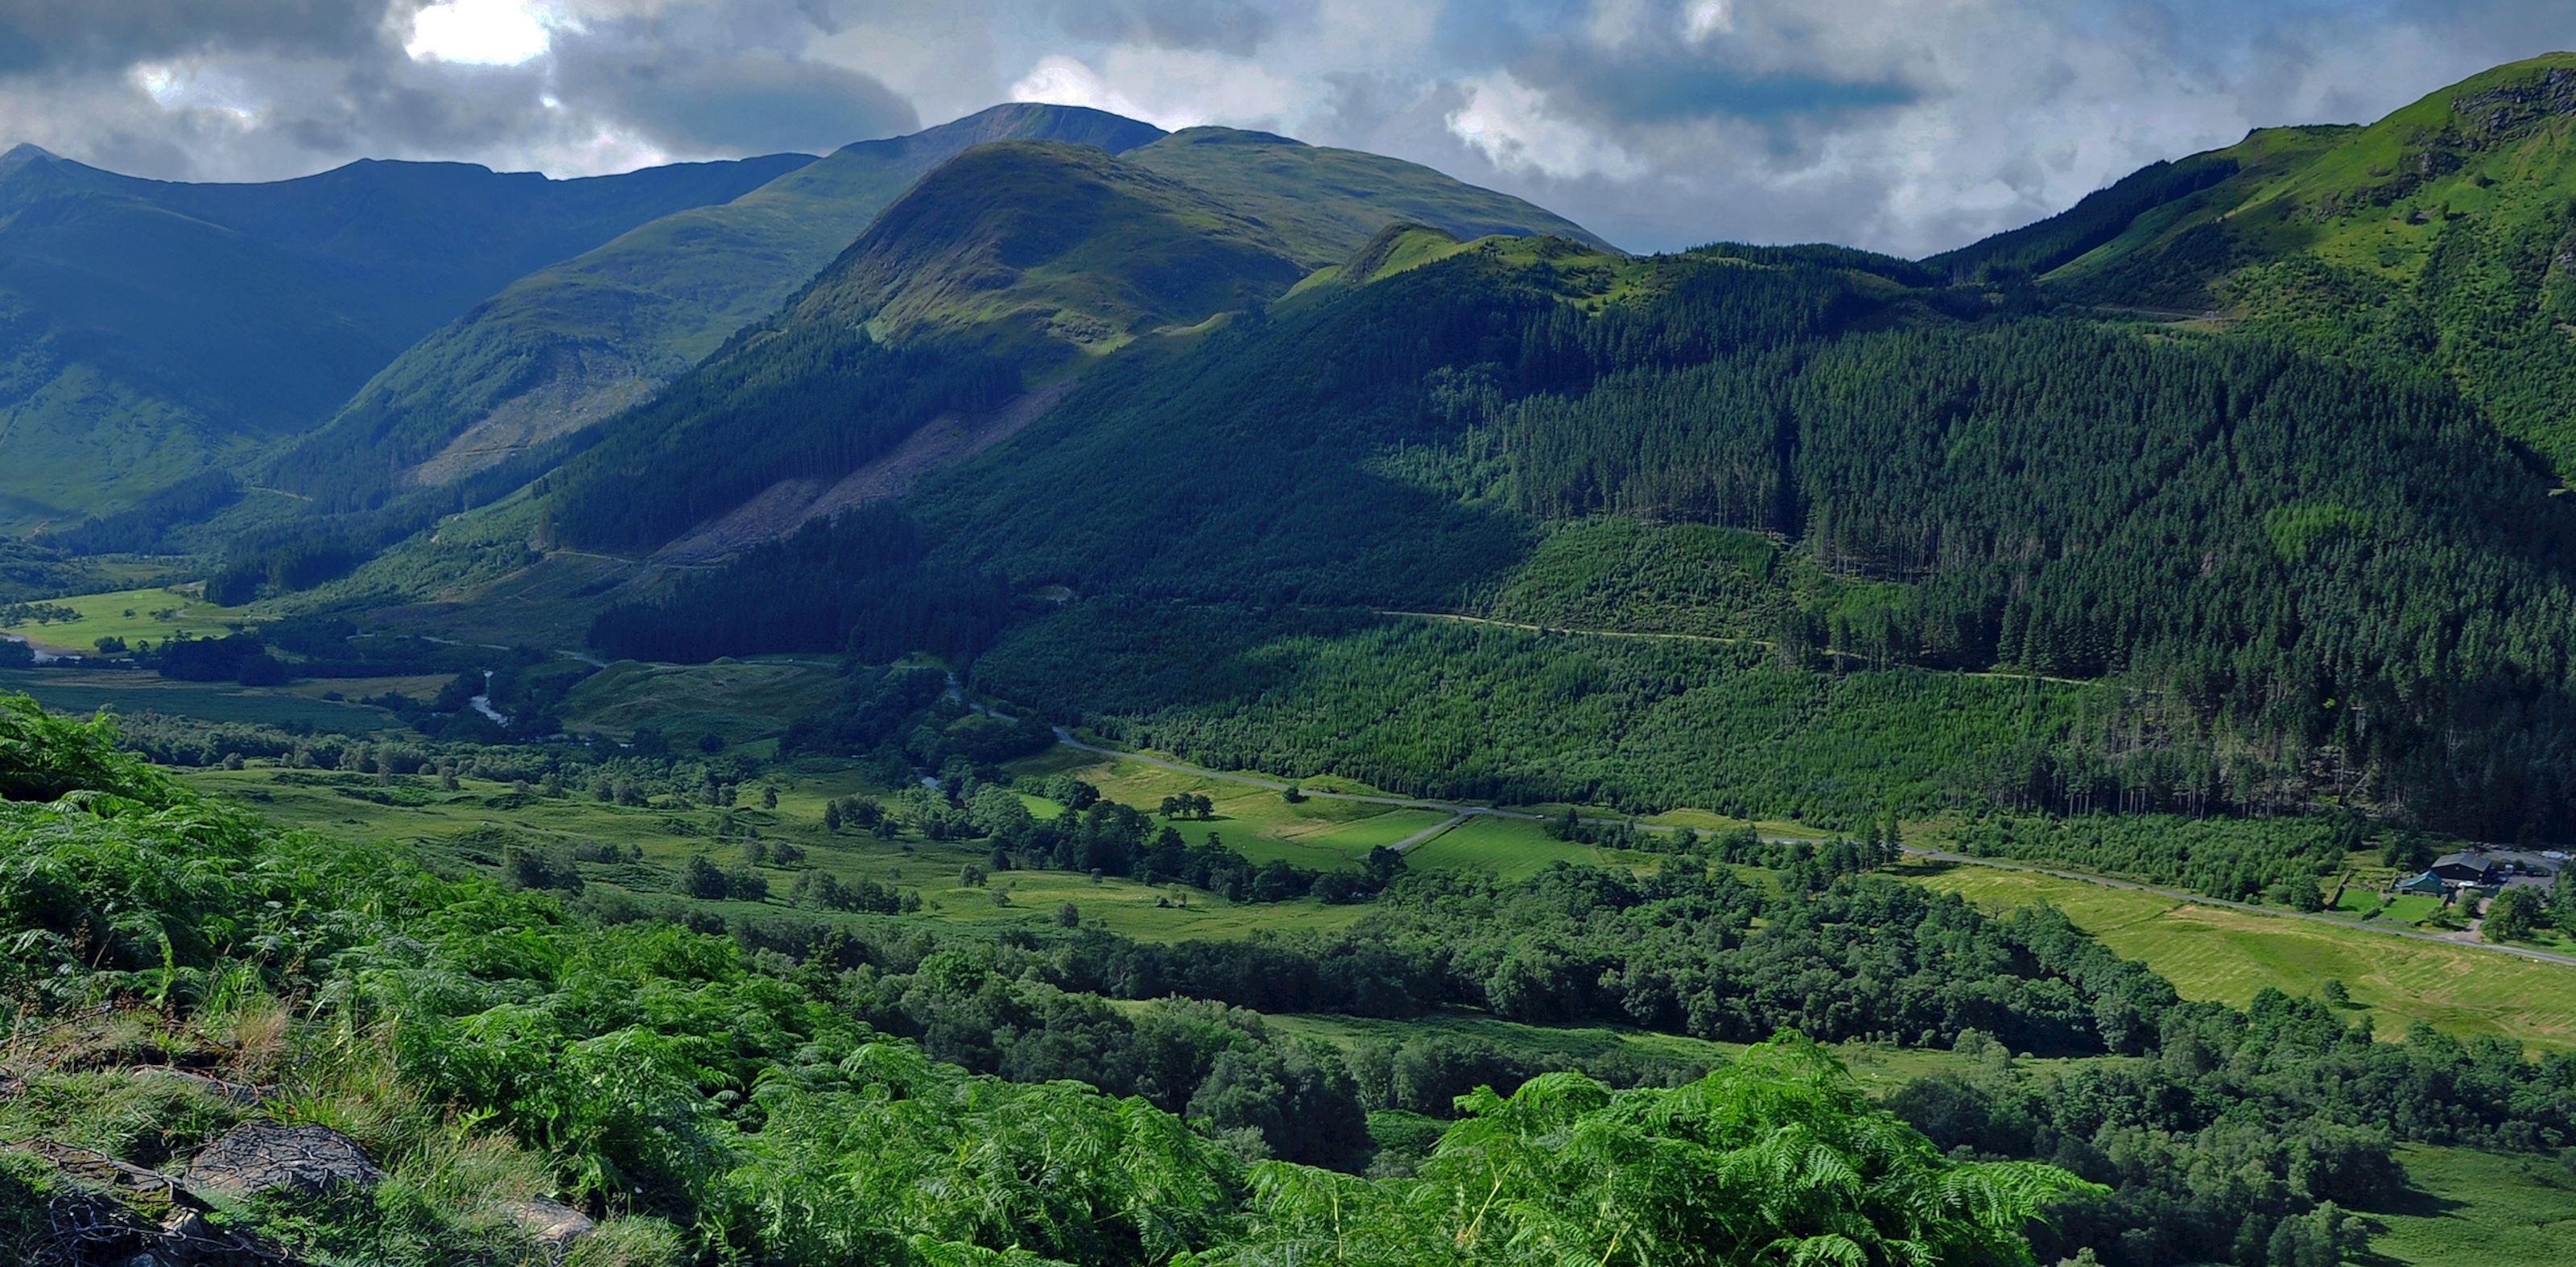 Climb Ben Nevis Challenge